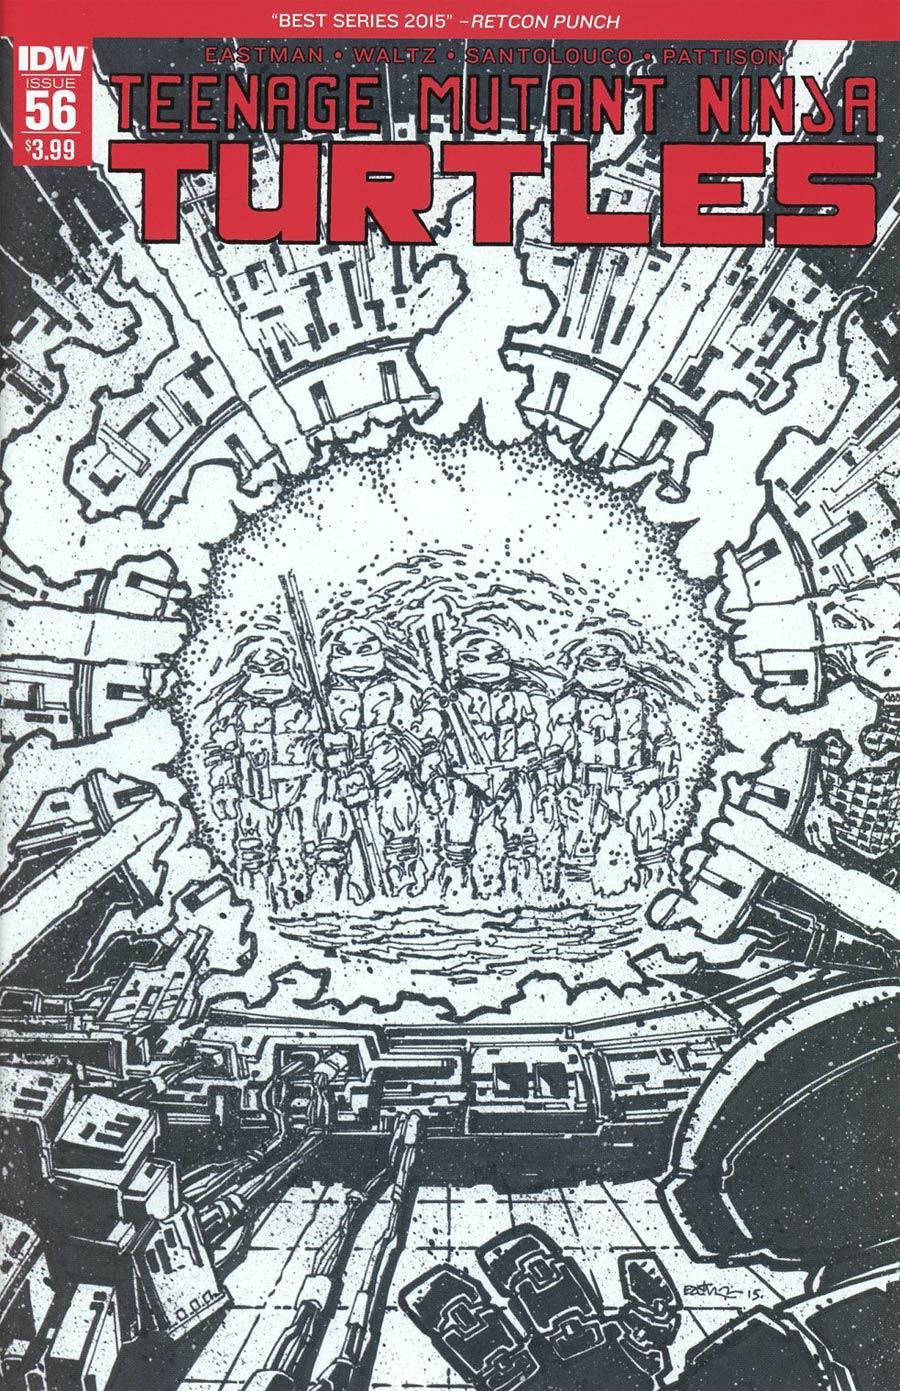 Teenage Mutant Ninja Turtles Vol 5 #56 Cover D 2nd Ptg Kevin Eastman Variant Cover